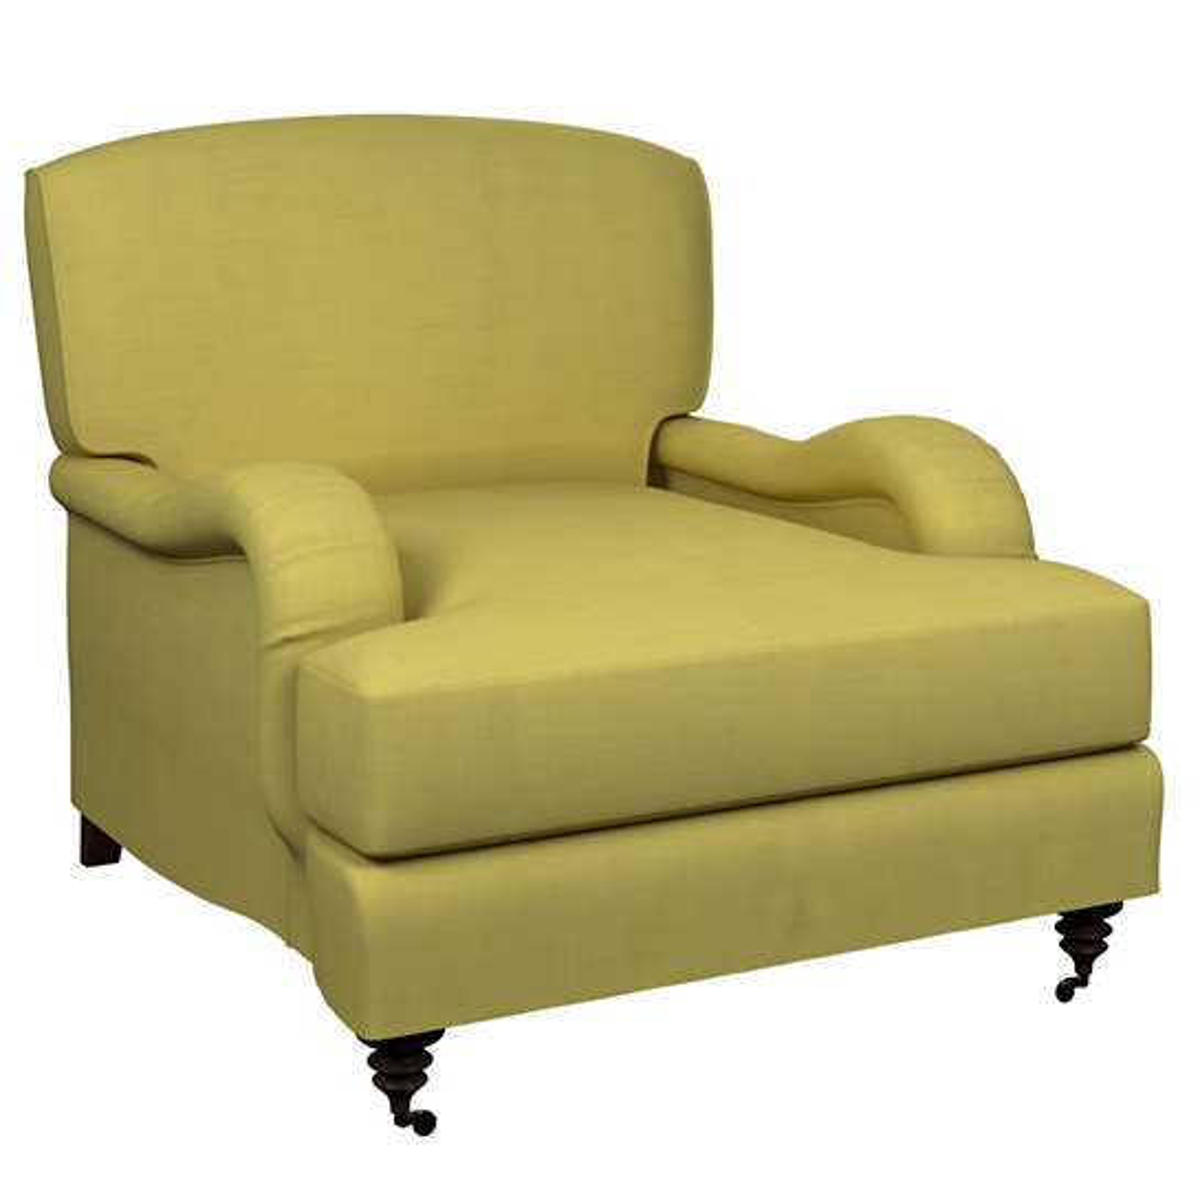 Estate Linen Citrus Litchfield Chair